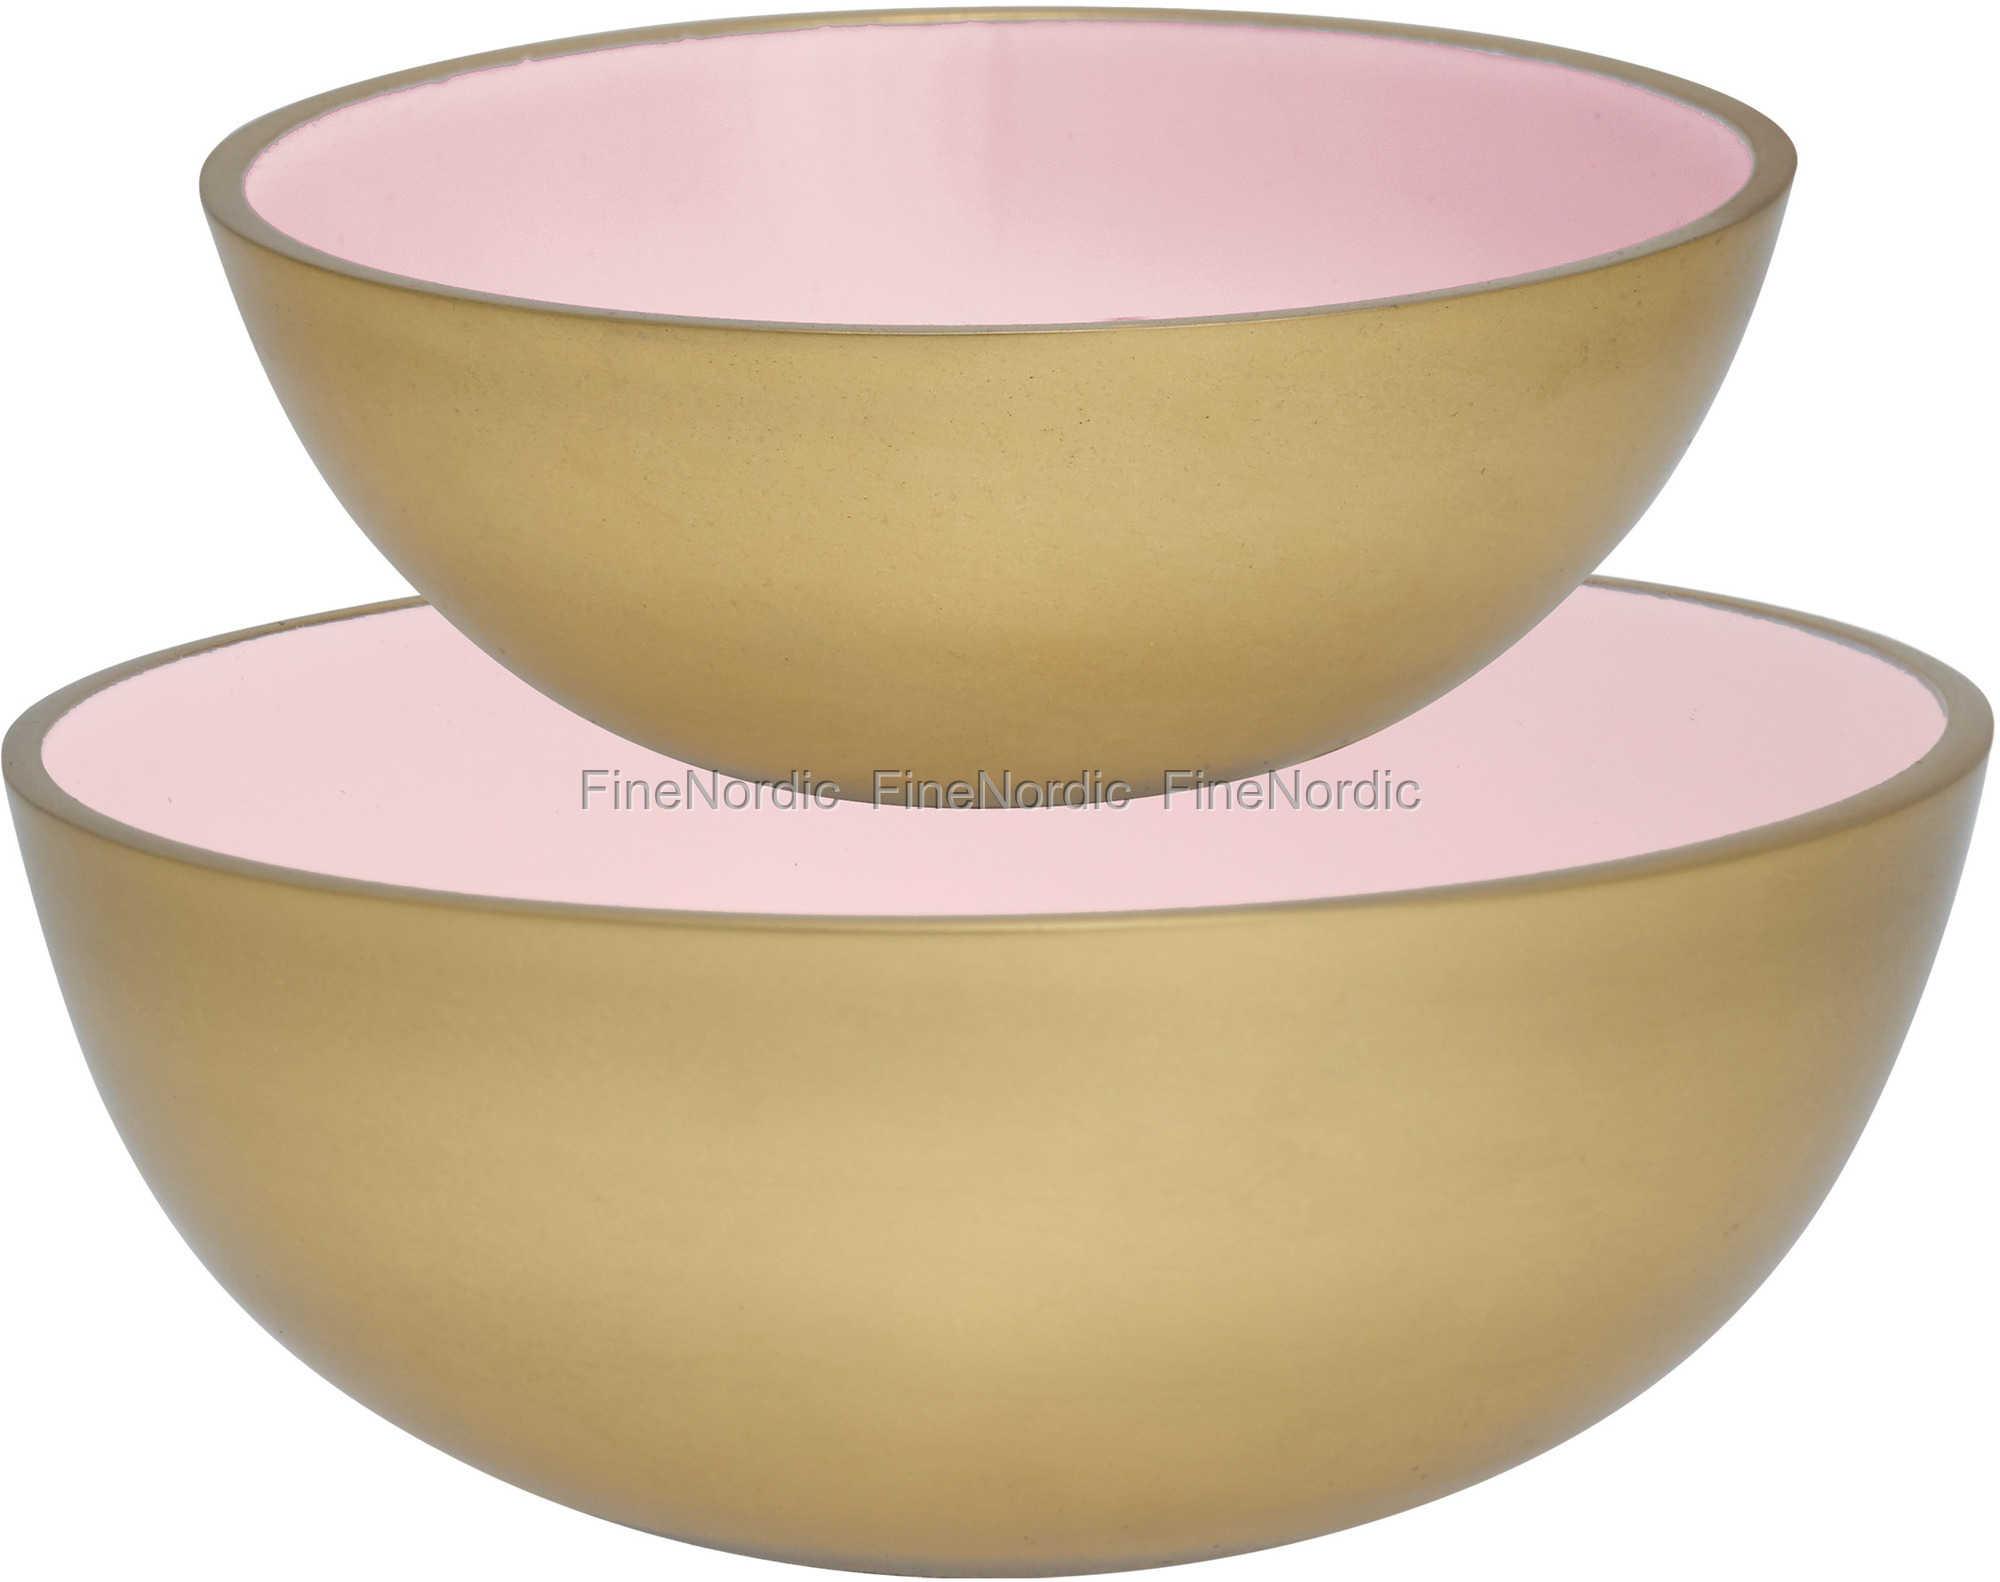 Greengate Espressotassen greengate alu bowls pale pink with gold set of 2 jpg